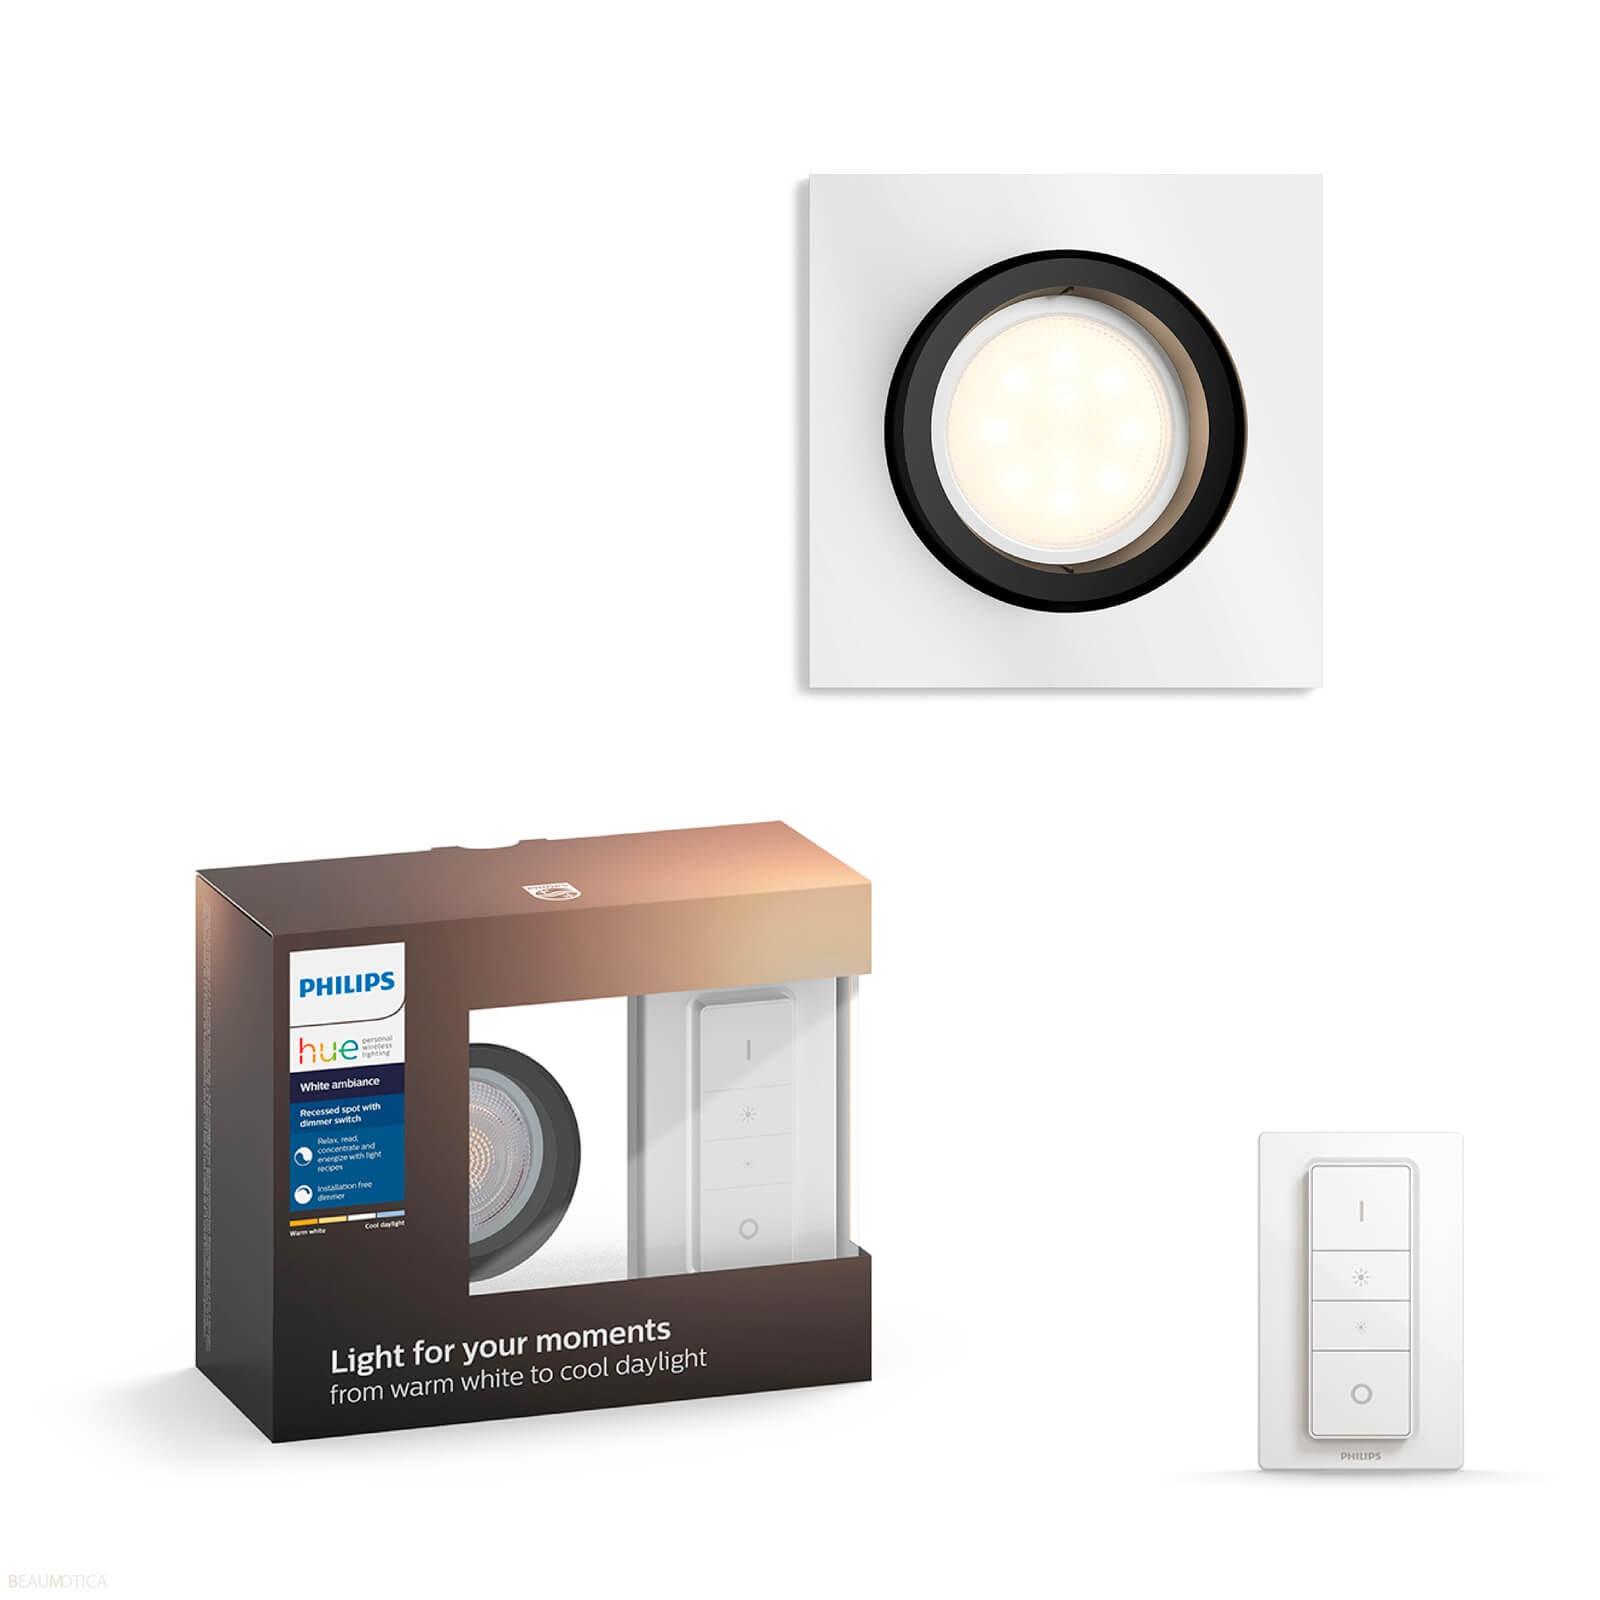 Philips Hue Hue Milliskin Spotlamp Vierkant inclusief Dimmer - White Ambiance